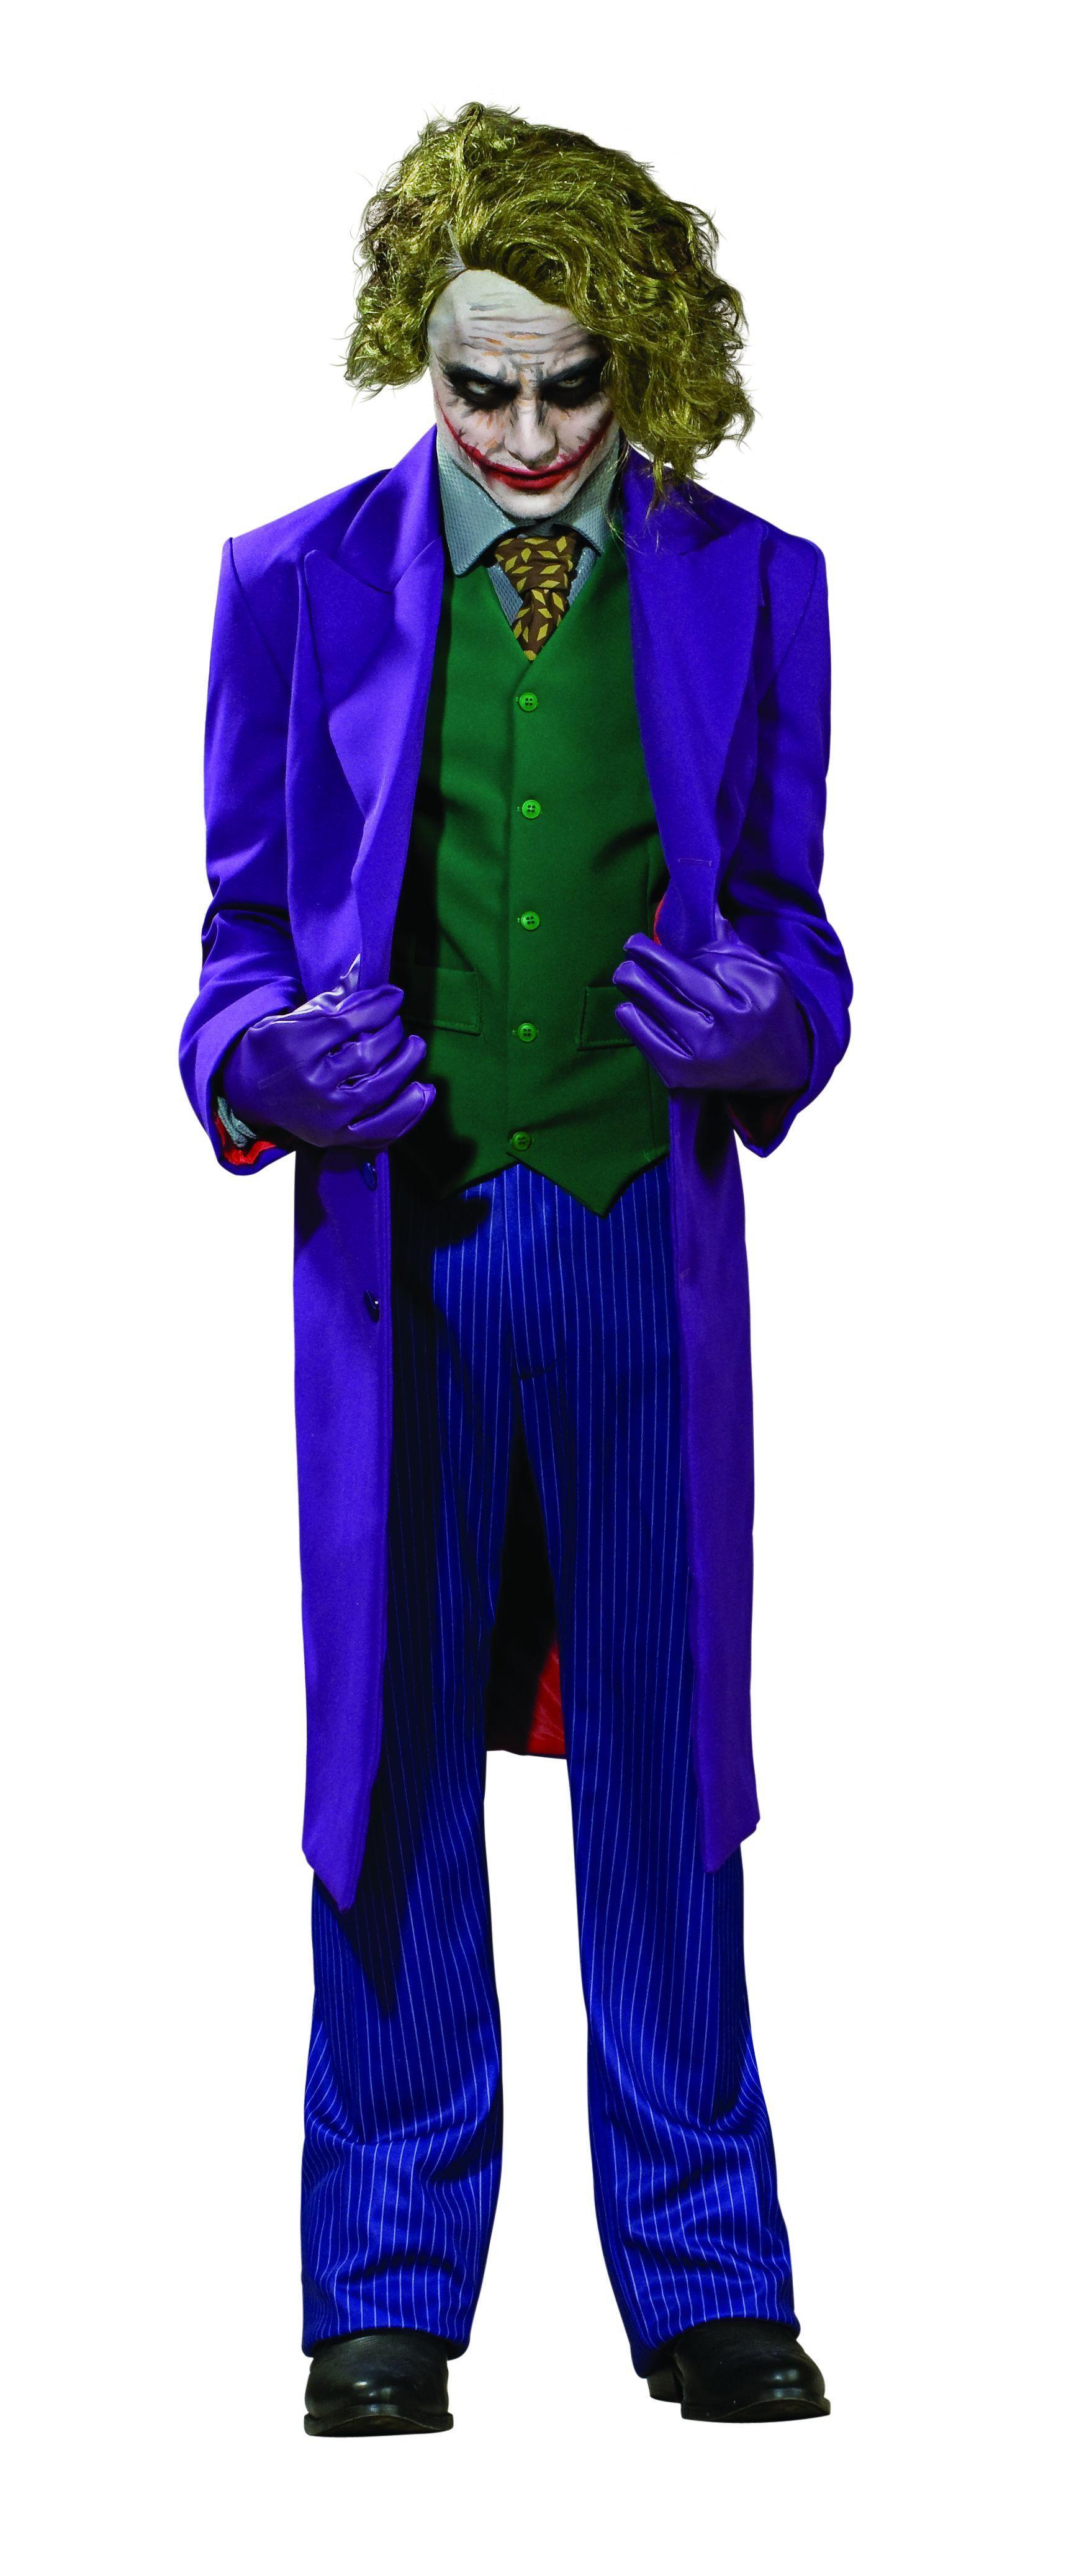 FANCY DRESS COSTUME ~ DELUXE GRAND HERITAGE JOKER XL